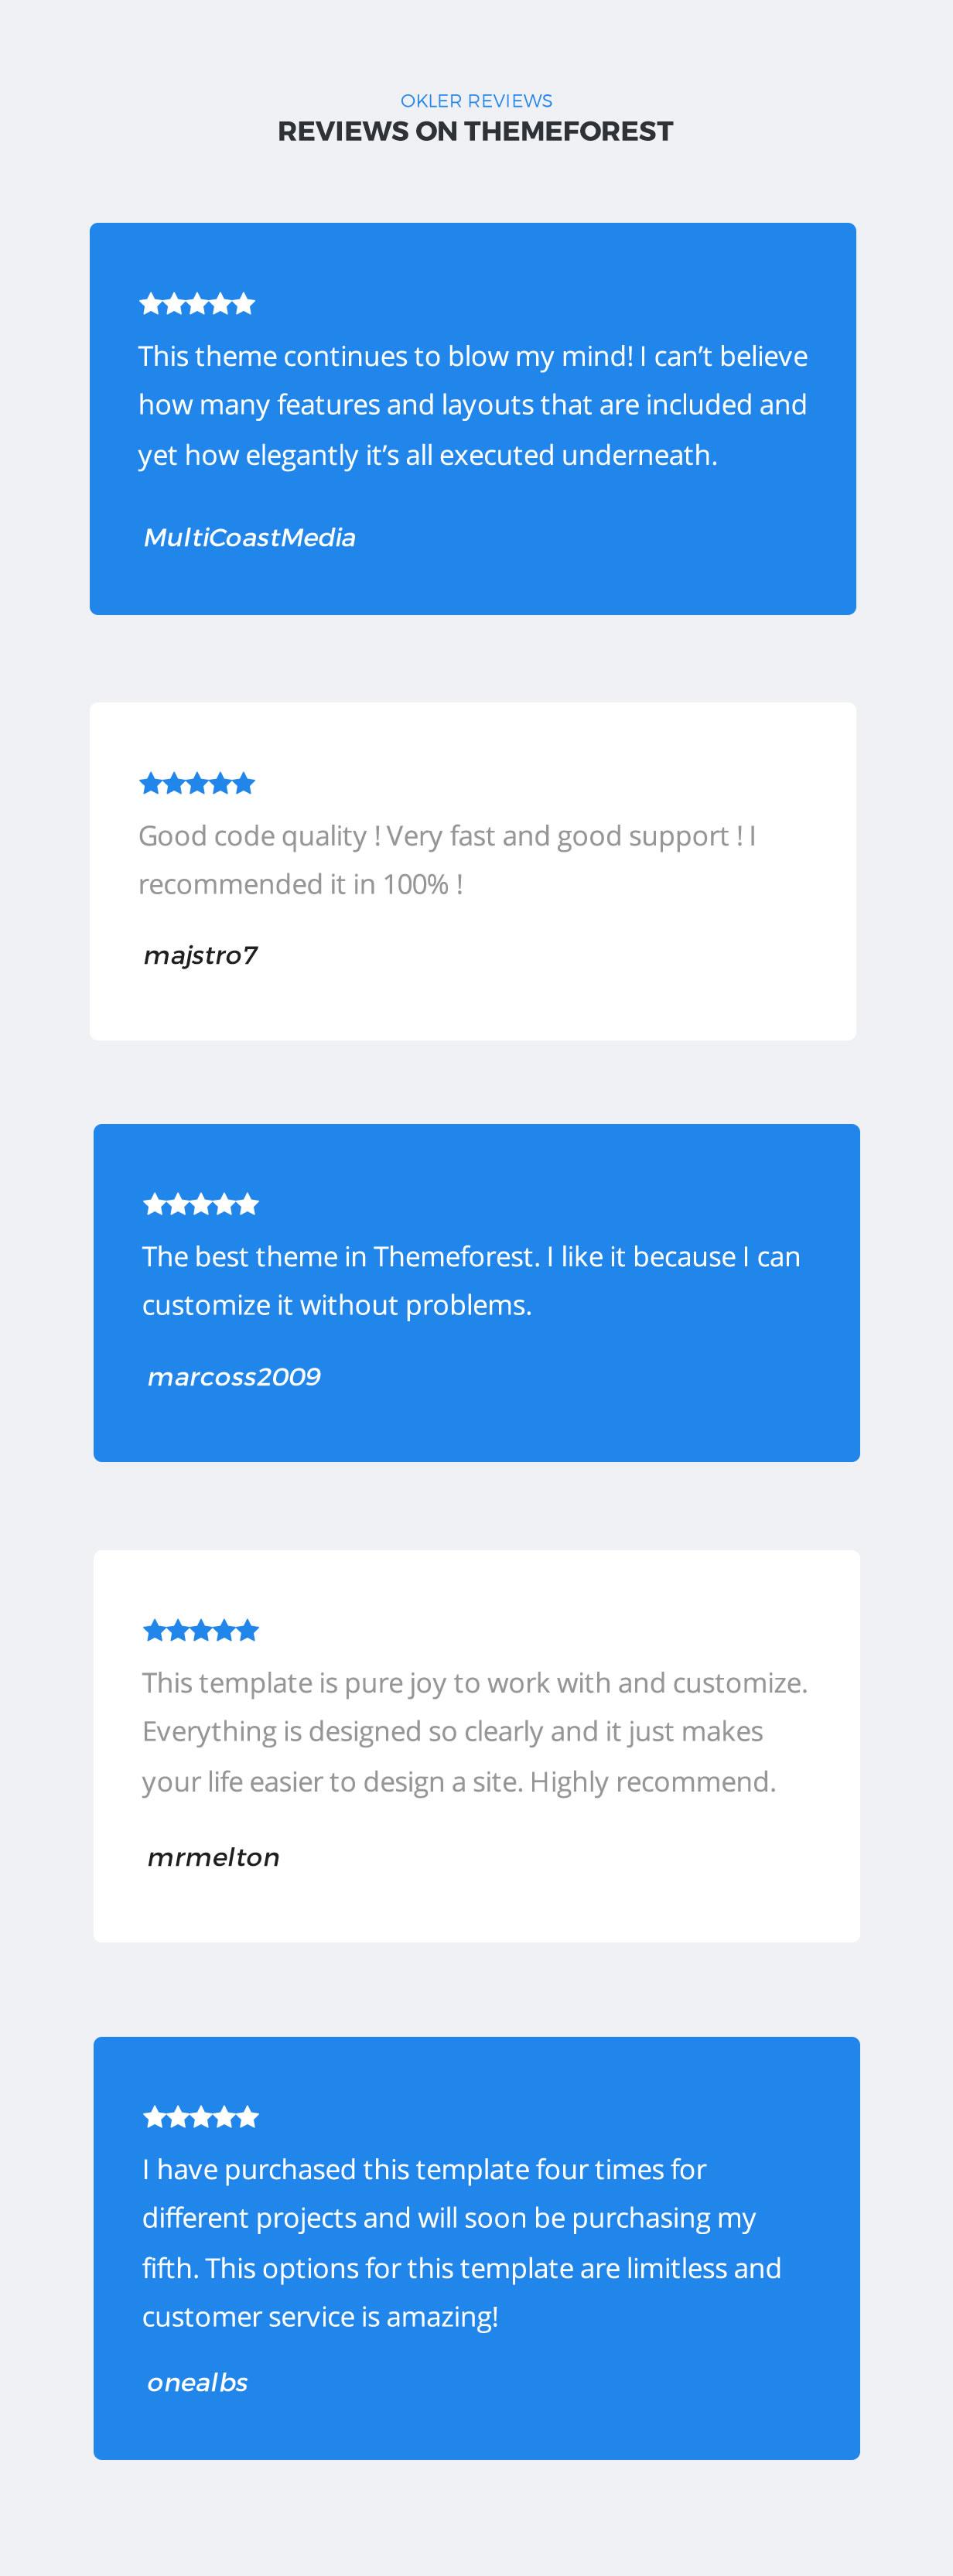 EZY - Responsive Multi-Purpose WordPress Theme - 6